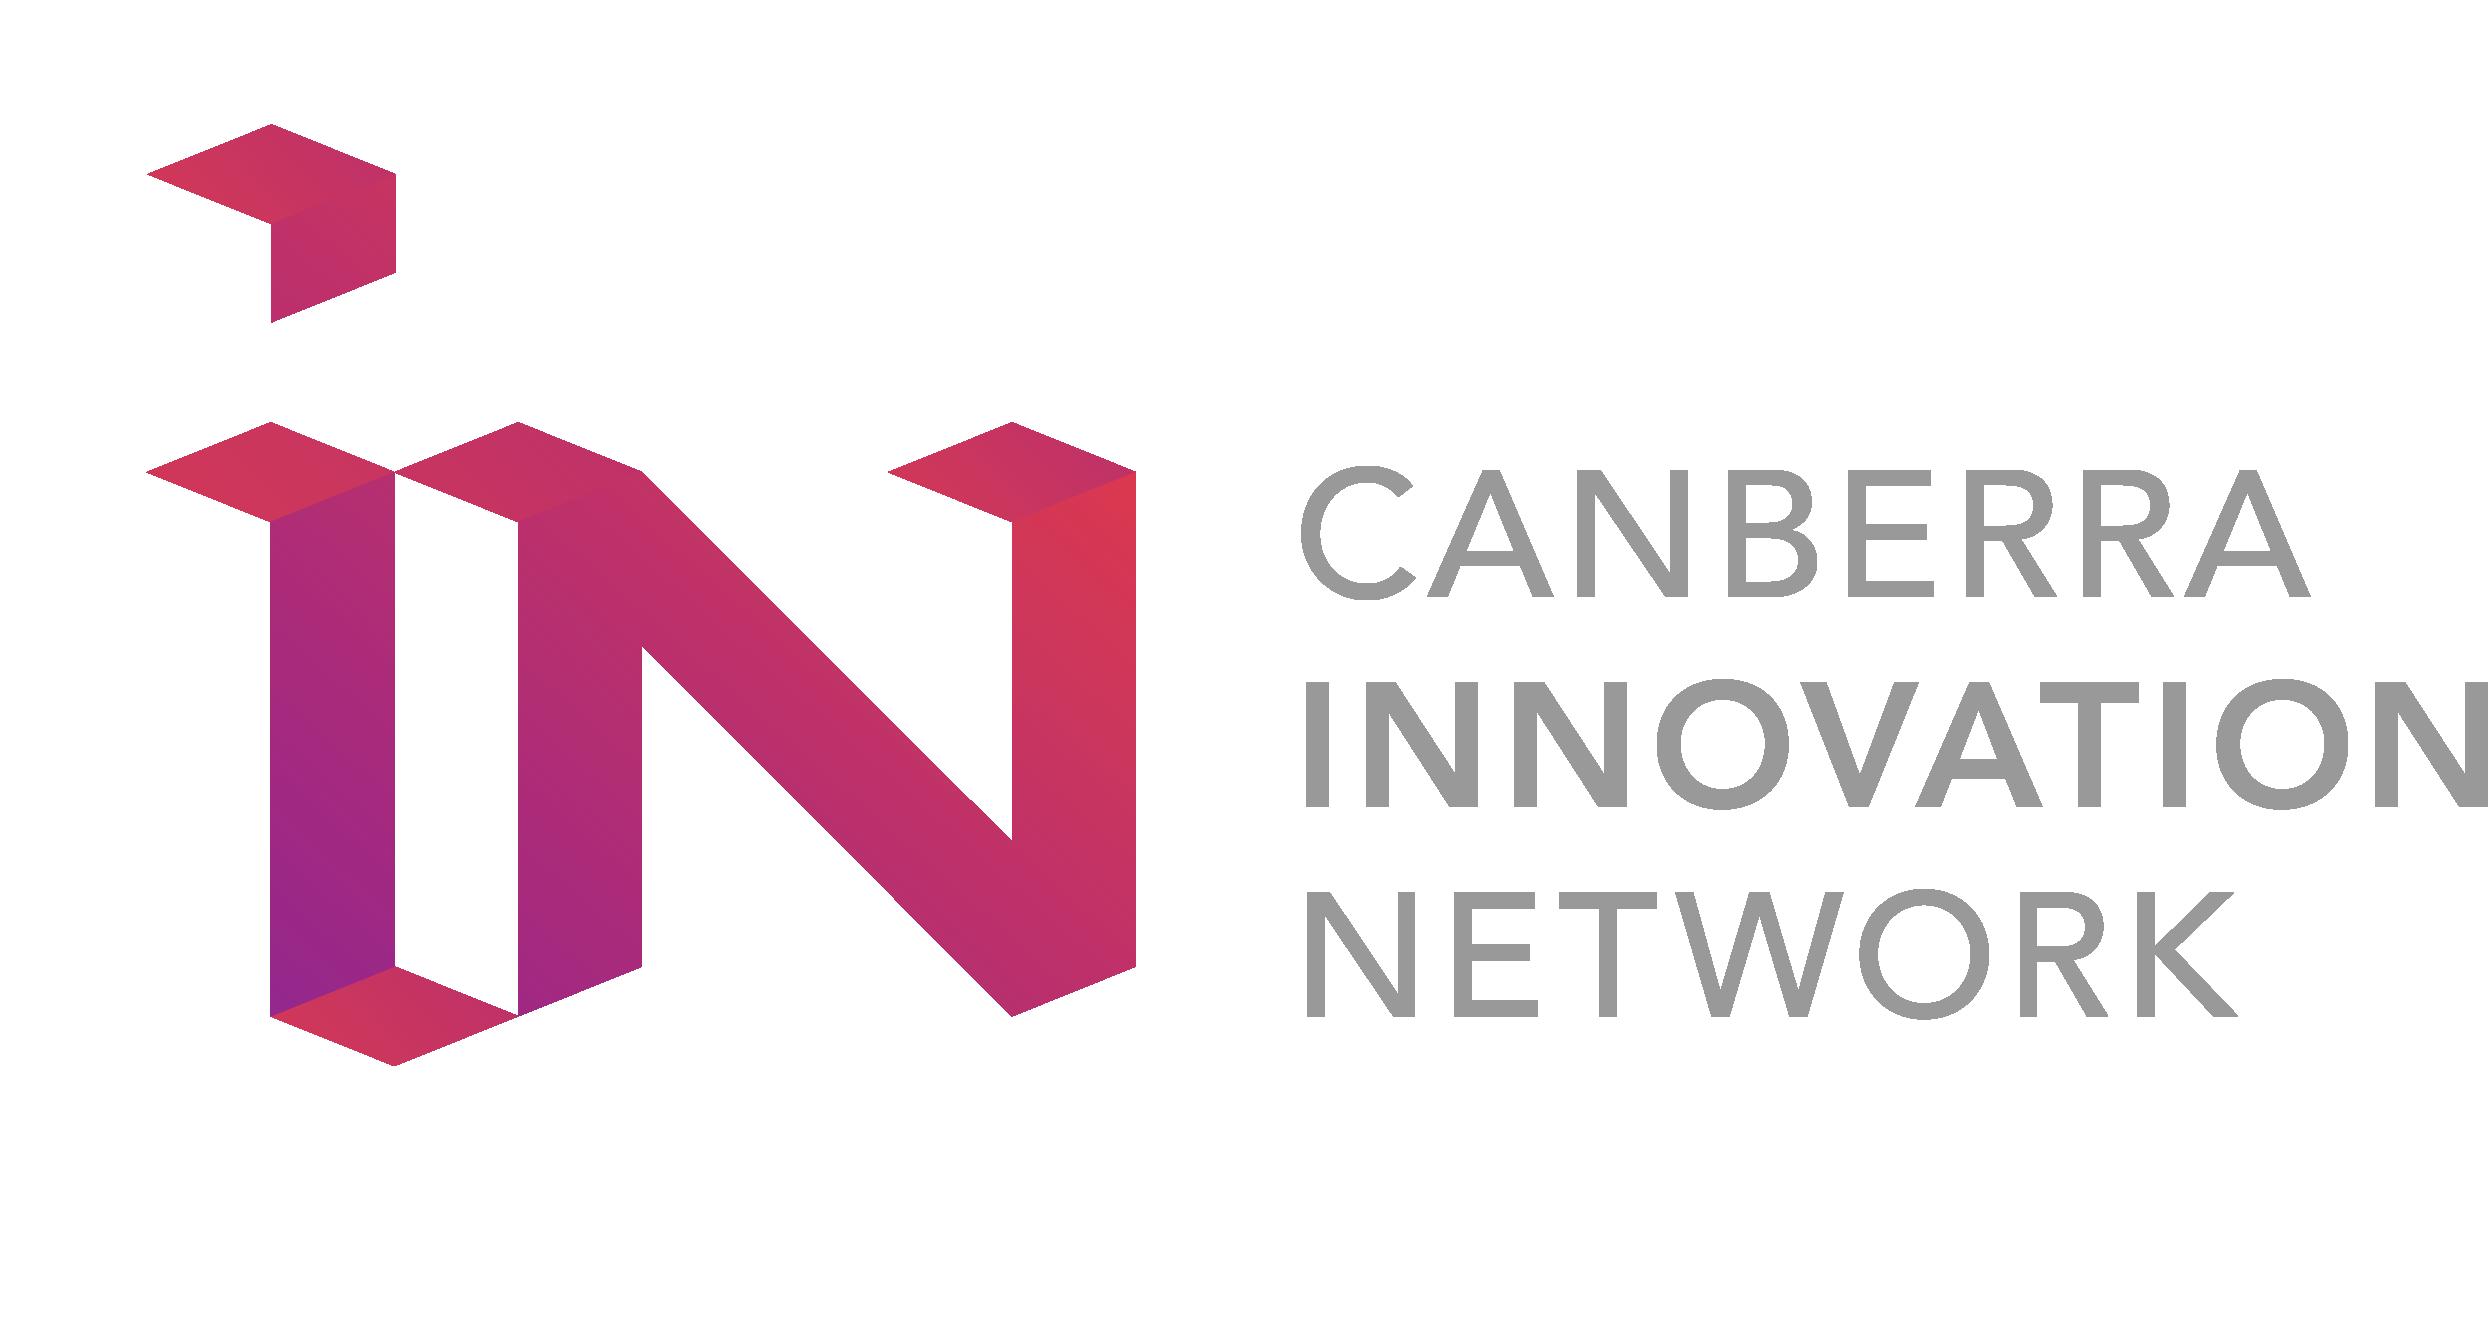 Canberra Innovation Network